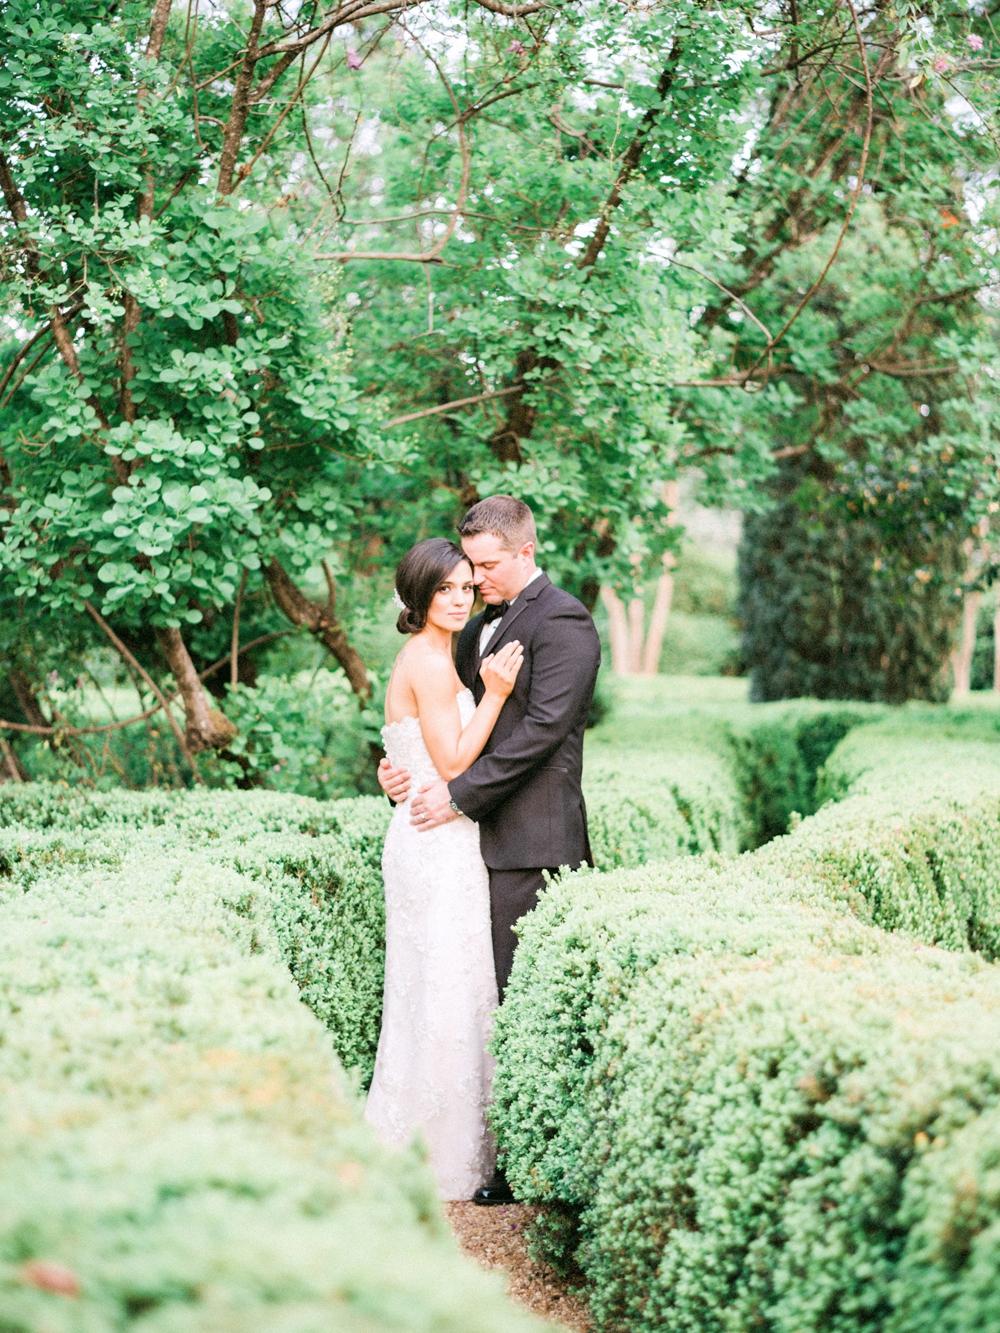 Barnsley Planation Wedding. Georgia Wedding Photographer_0033.jpg